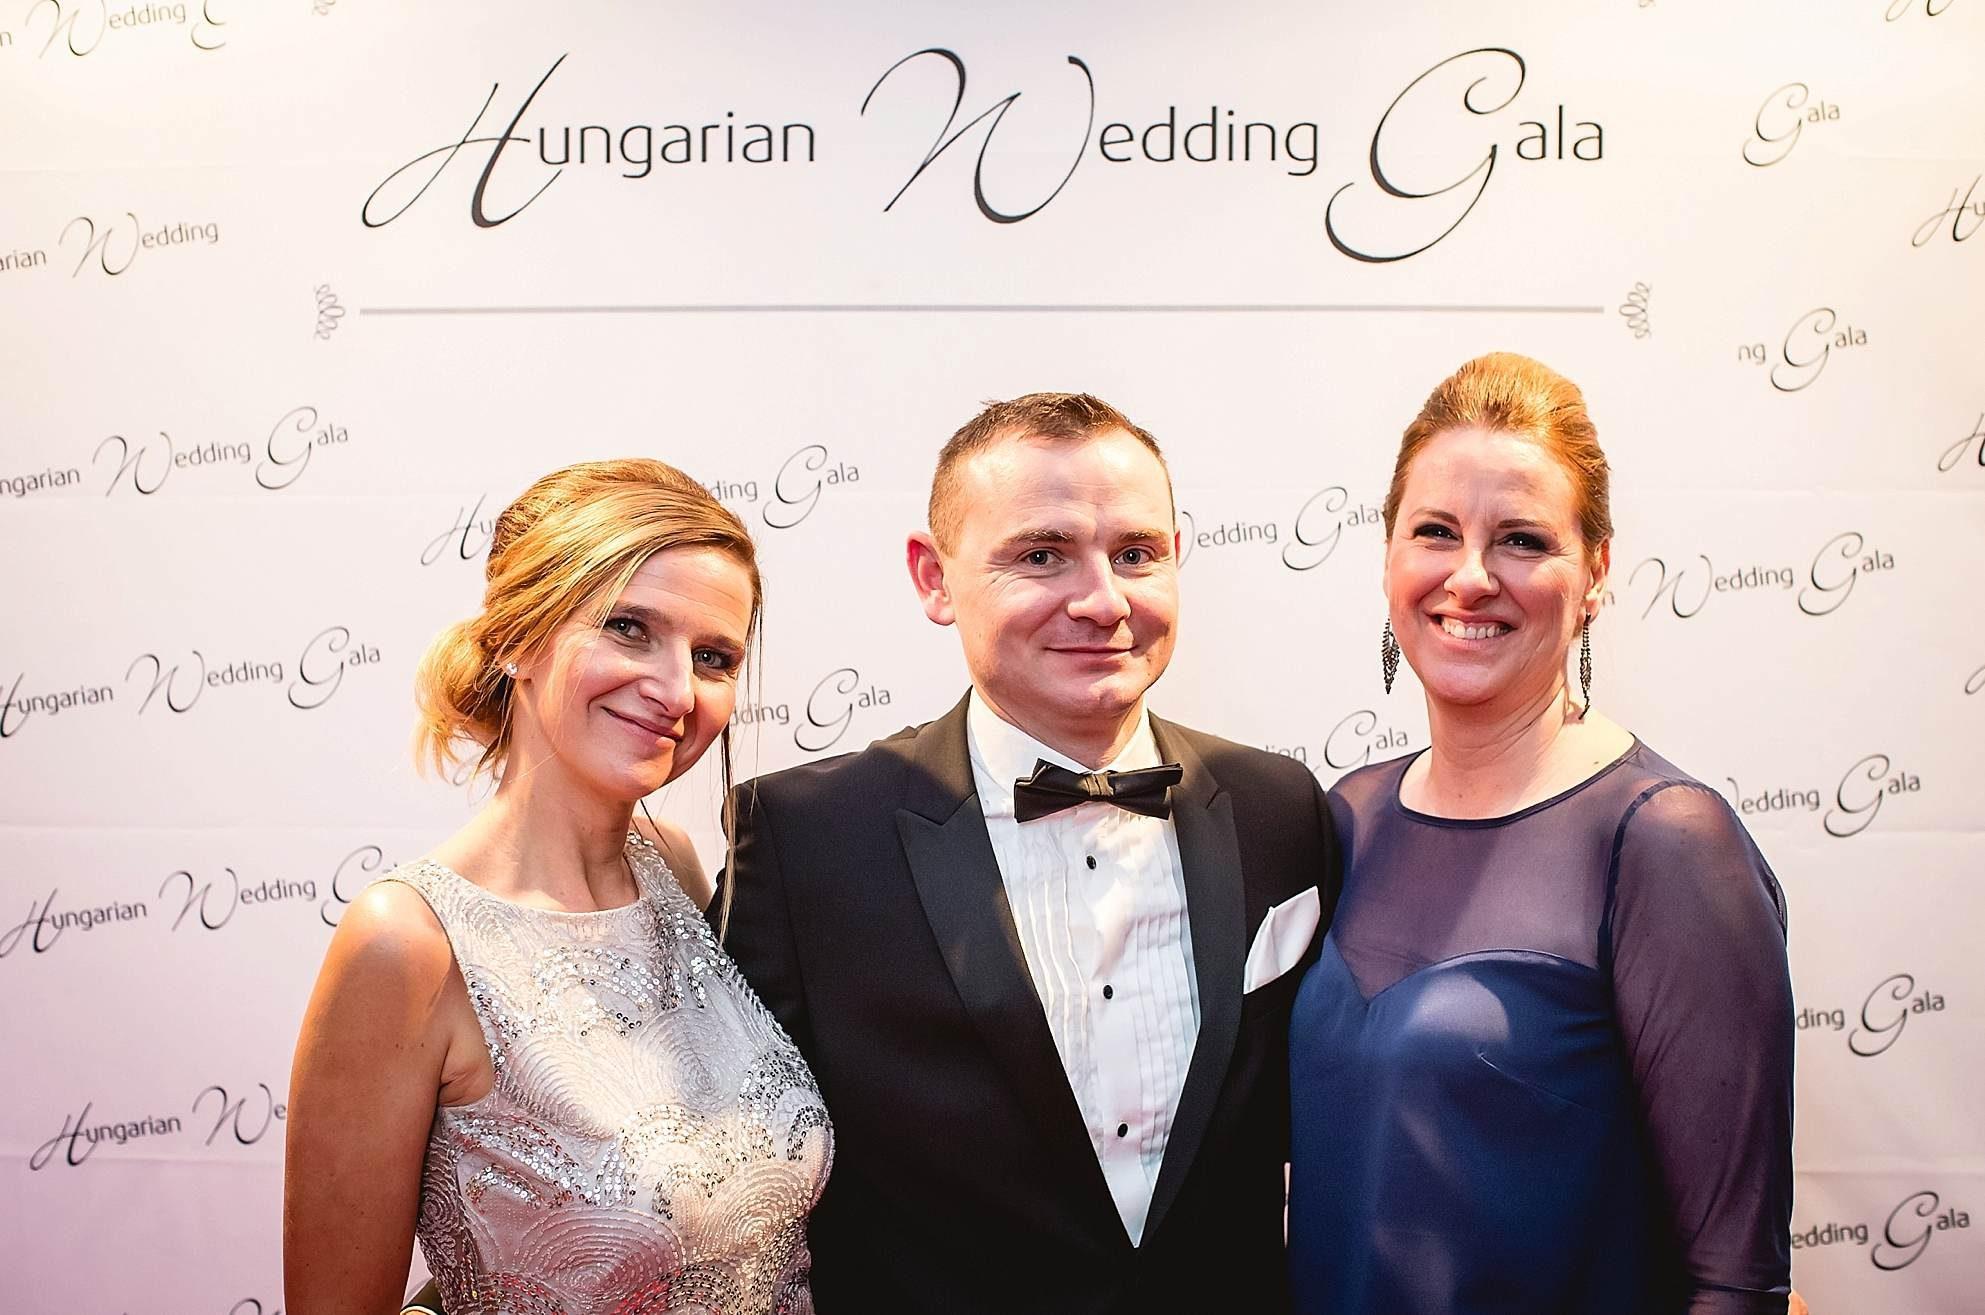 ,Hungarian Wedding Gála 2016,Hungarian Wedding Gála,Wedding Gála 2016,Wedding Gála,Déri Annamária, Landesz Katalin,